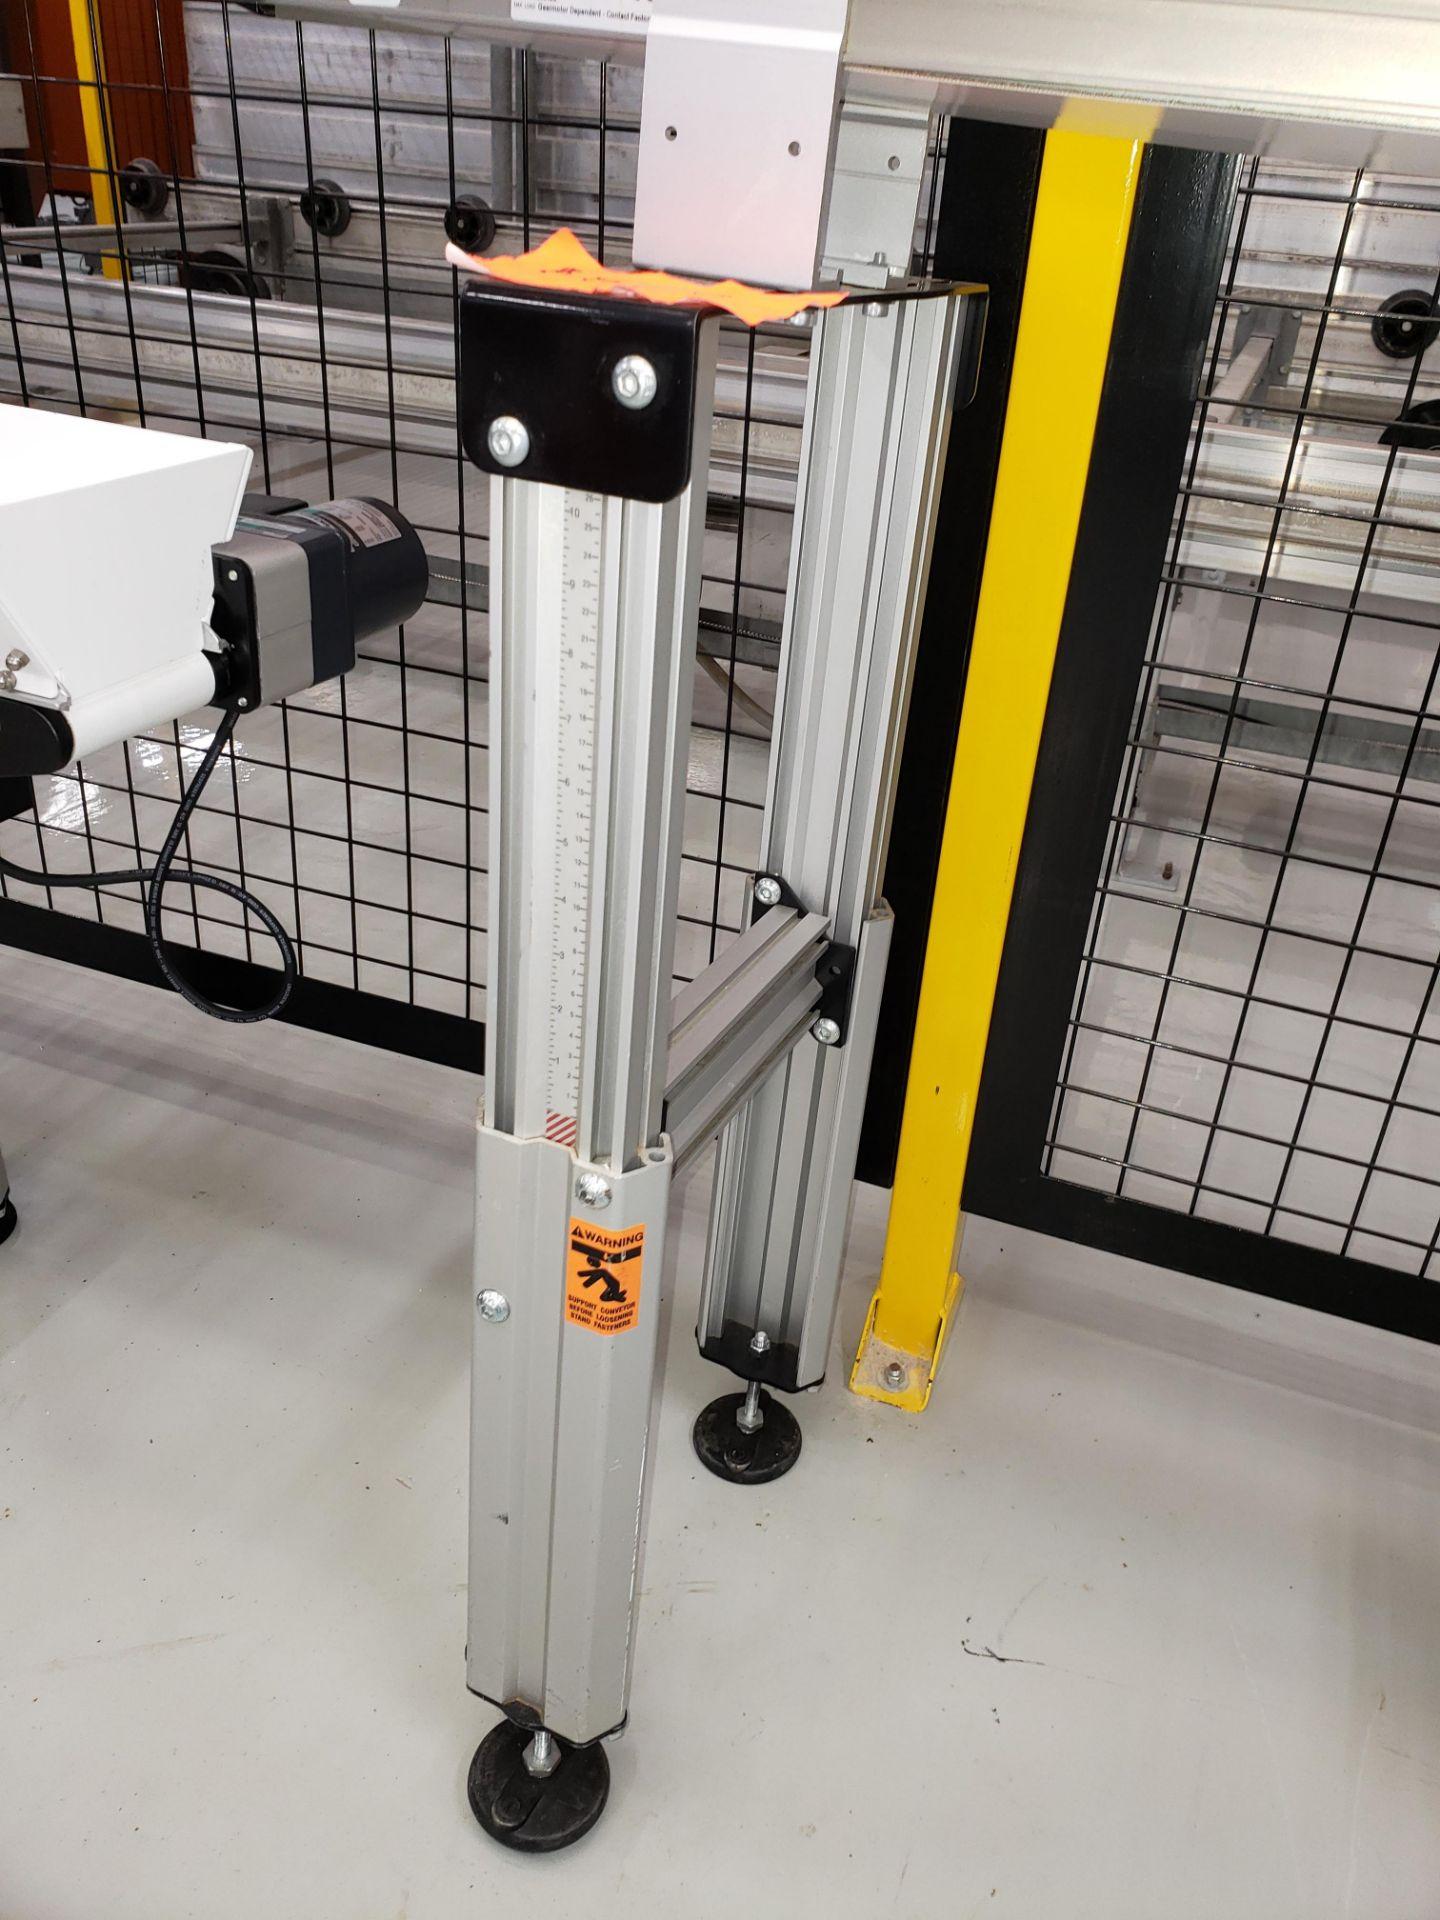 Kierton Twister Input Conveyor 5.5' - Image 5 of 9